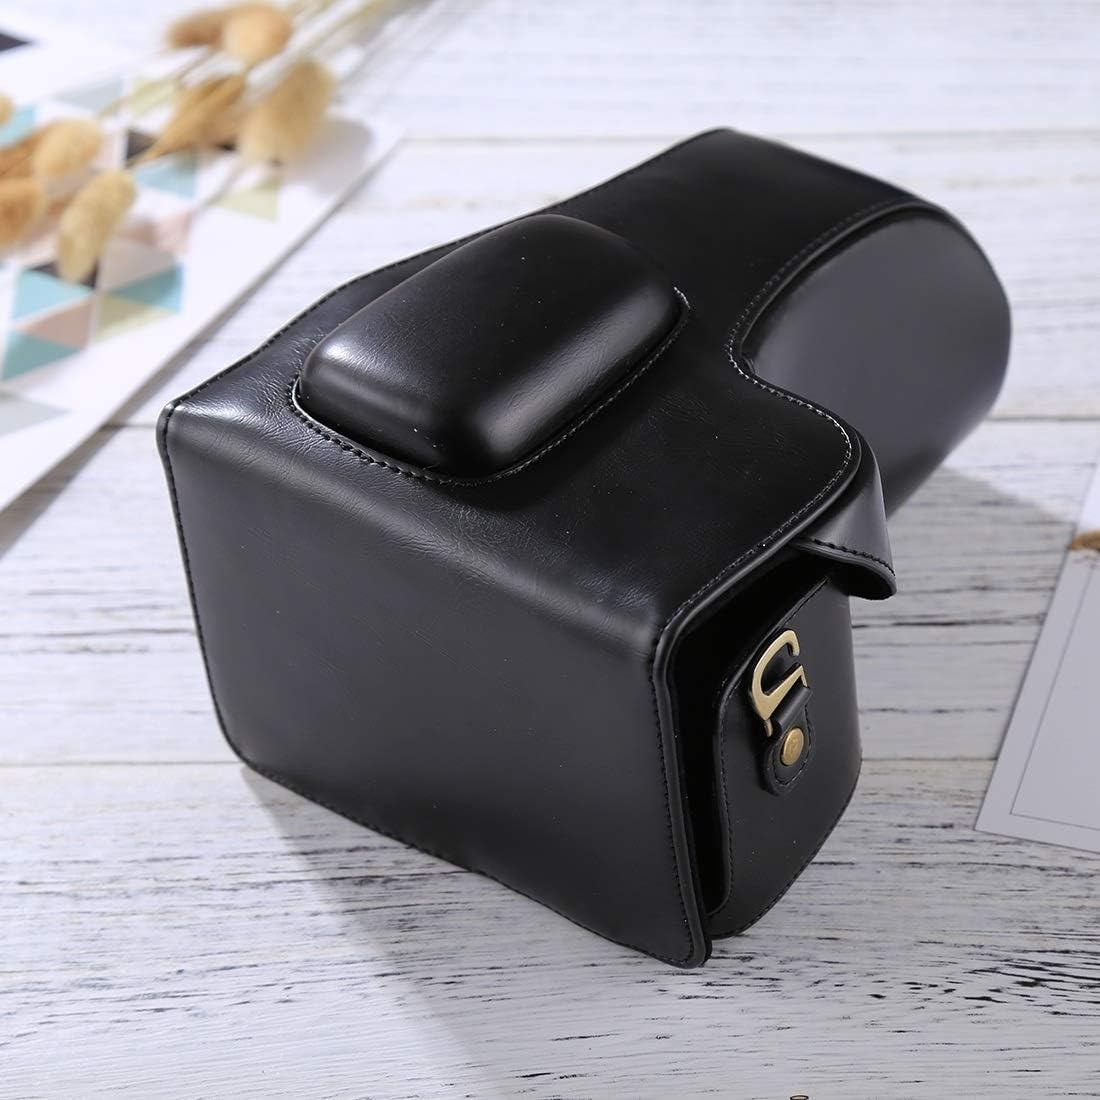 18-55mm // 18-105mm Lens Yangjingya Camera Bag Wide Body Camera PU Leather Case Bag for Nikon D3200 // D3300 // D3400 Black Color : Coffee